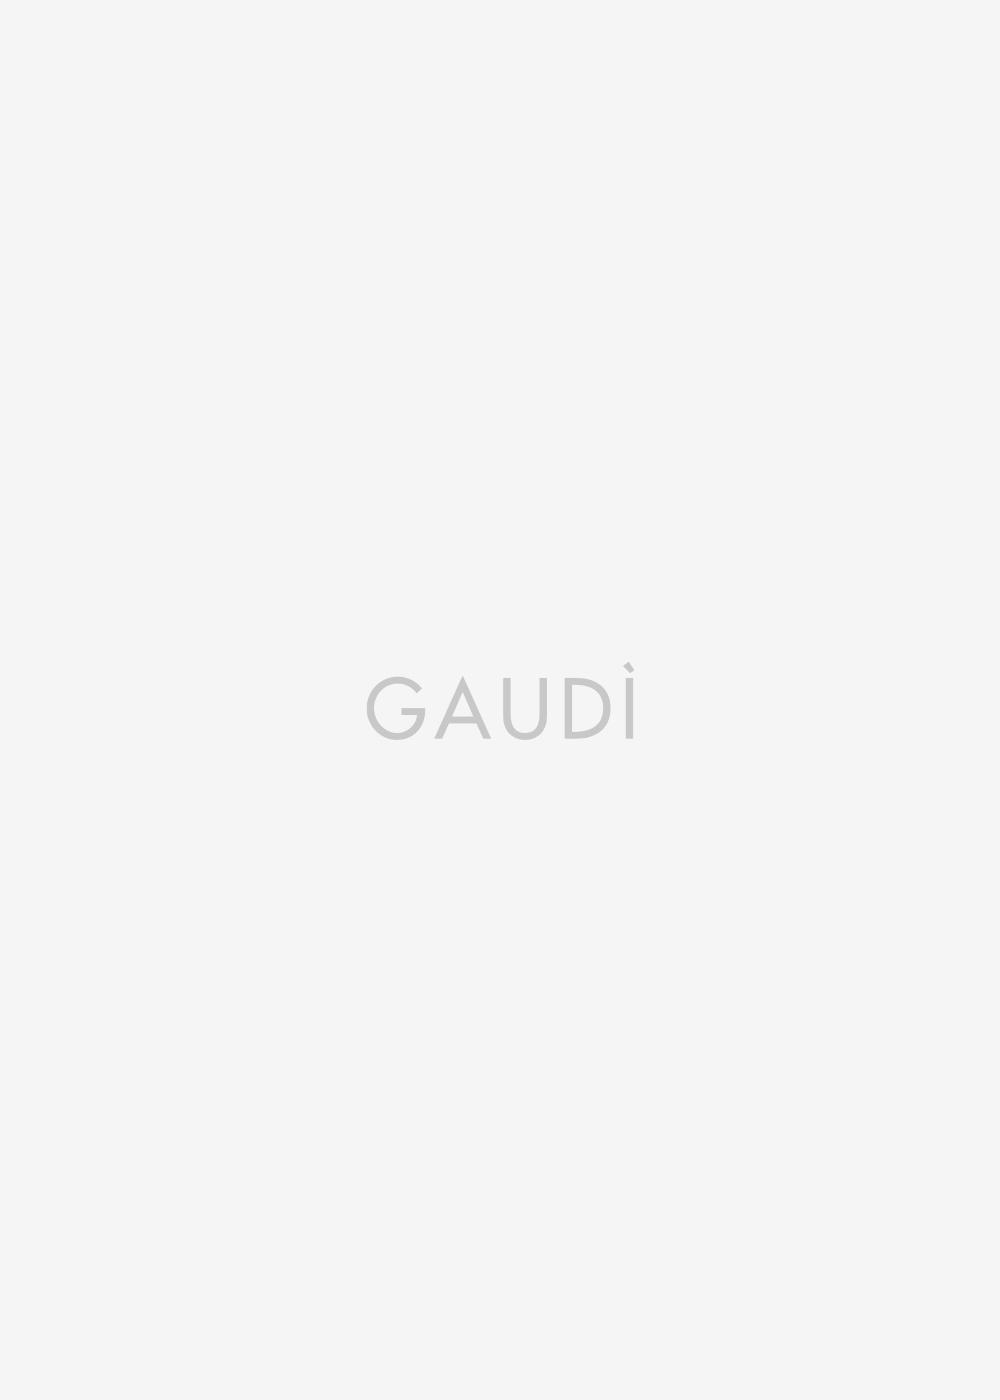 Dlhé a krátke letné dámske sukne – Gaudi 9d9c3e3ee48